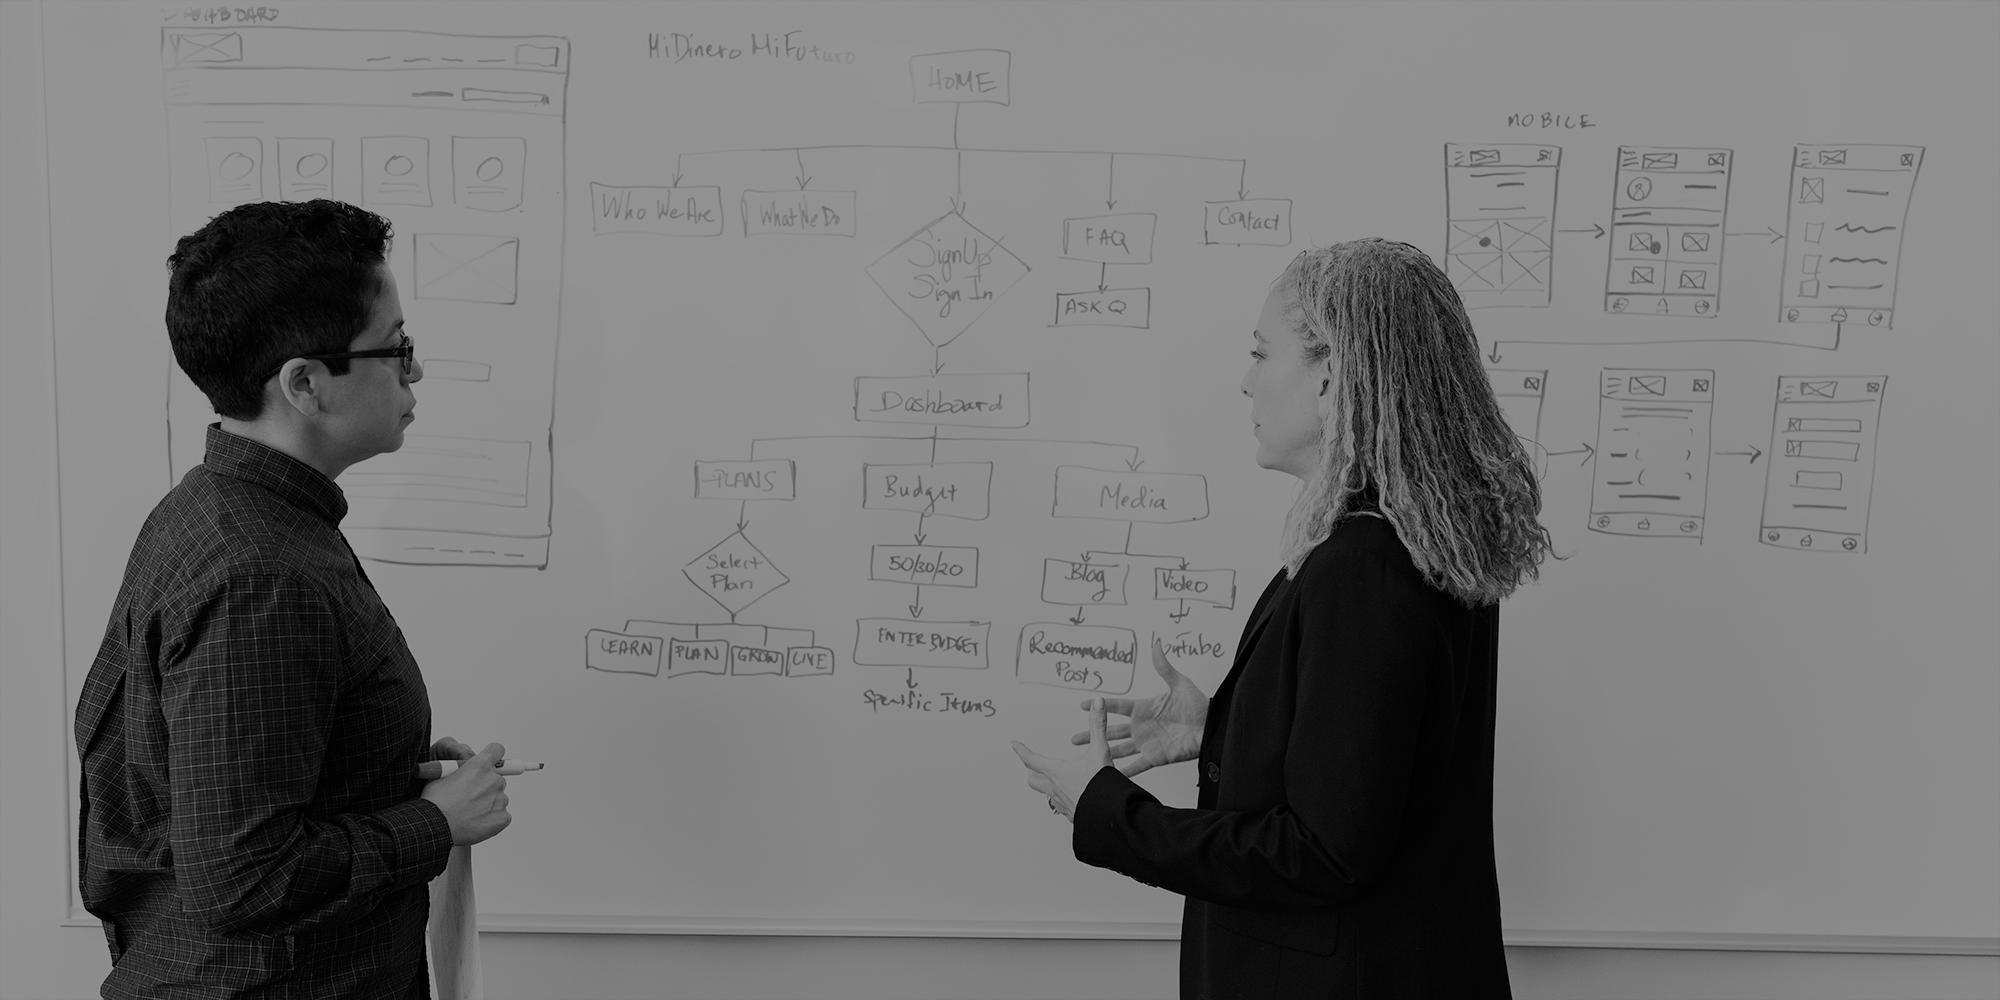 Brainstorm like a UX Pro